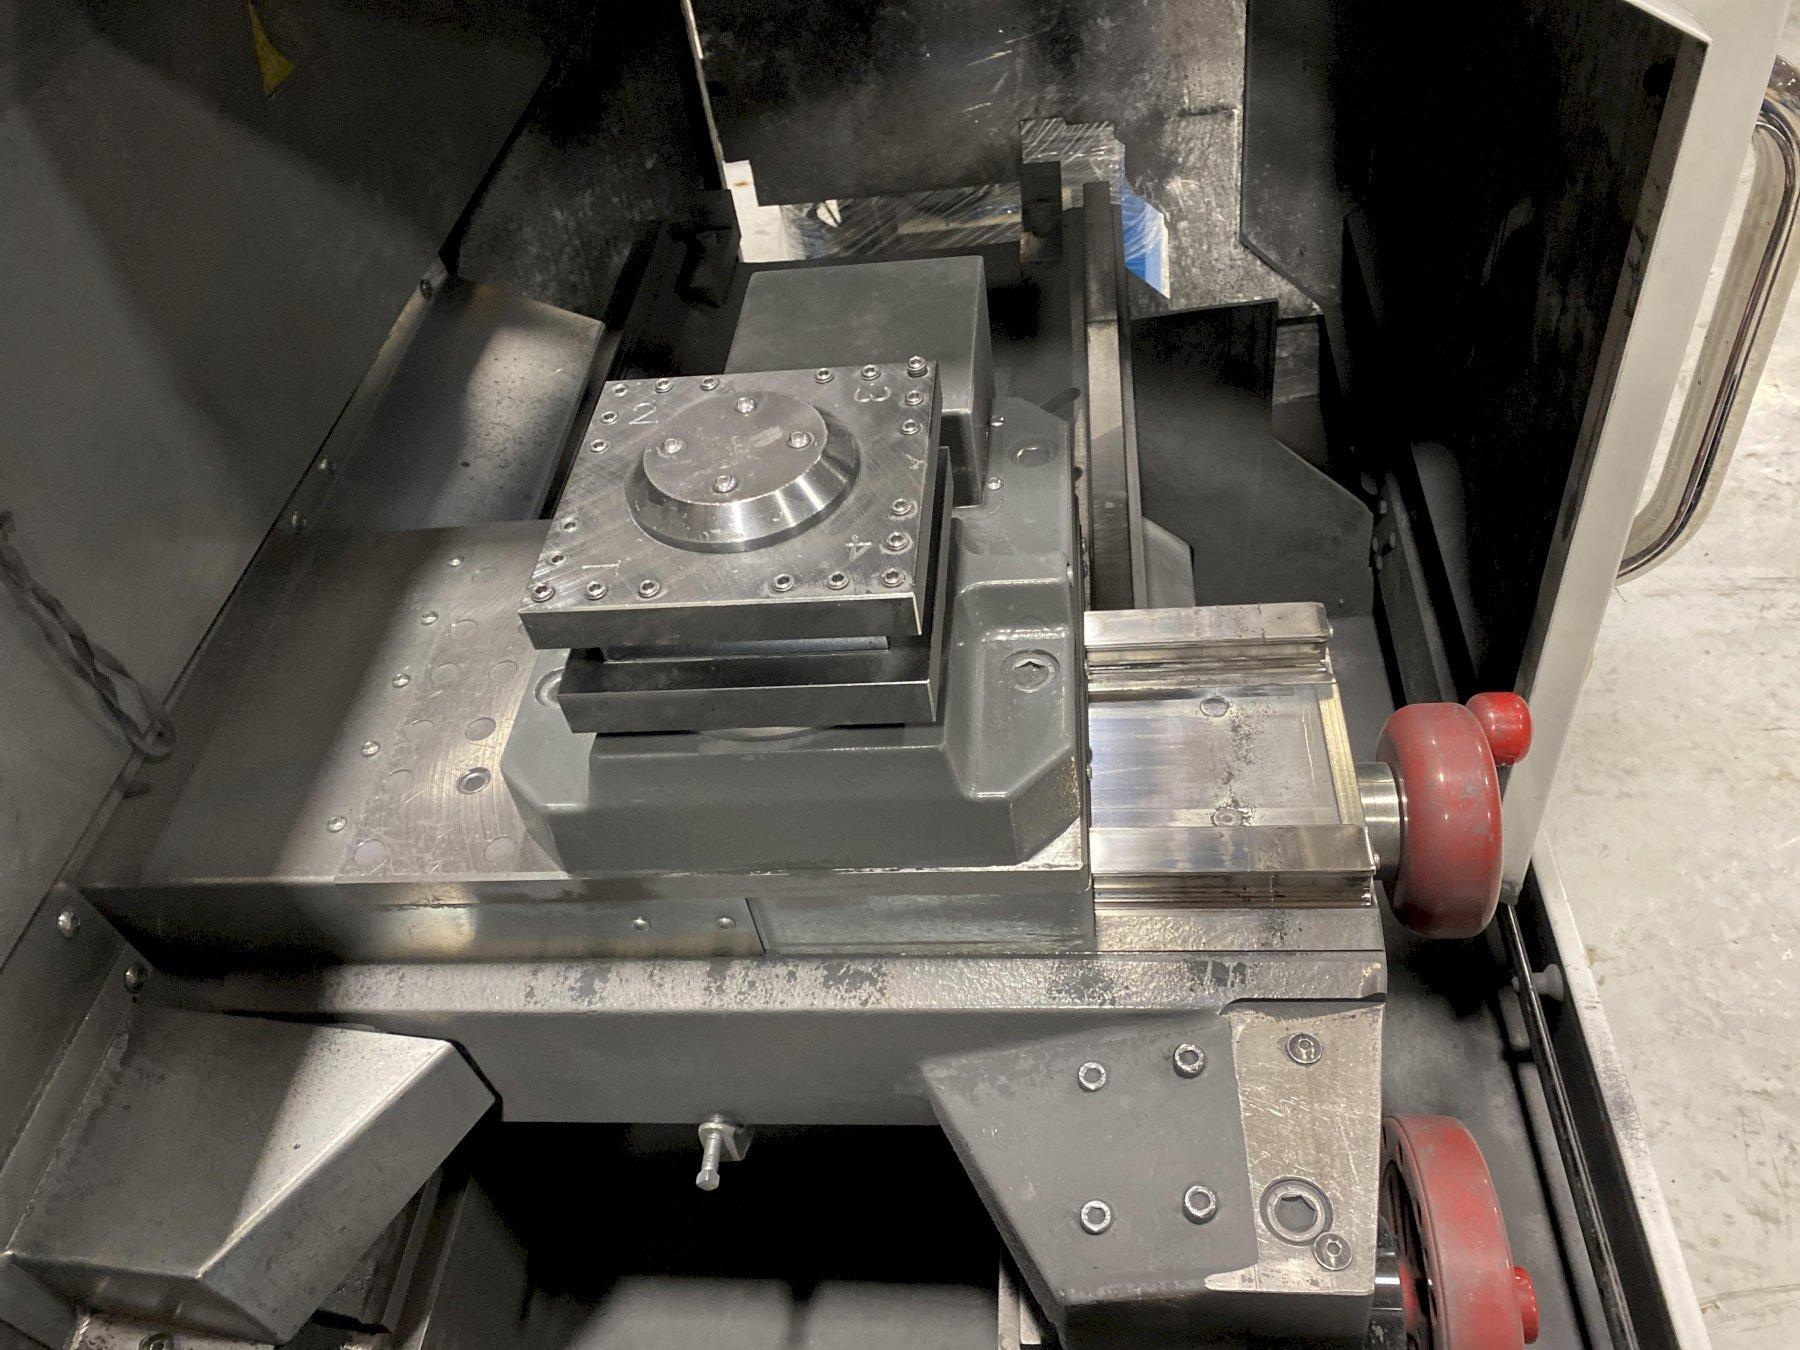 2012 Haas TL-1 CNC Lathe